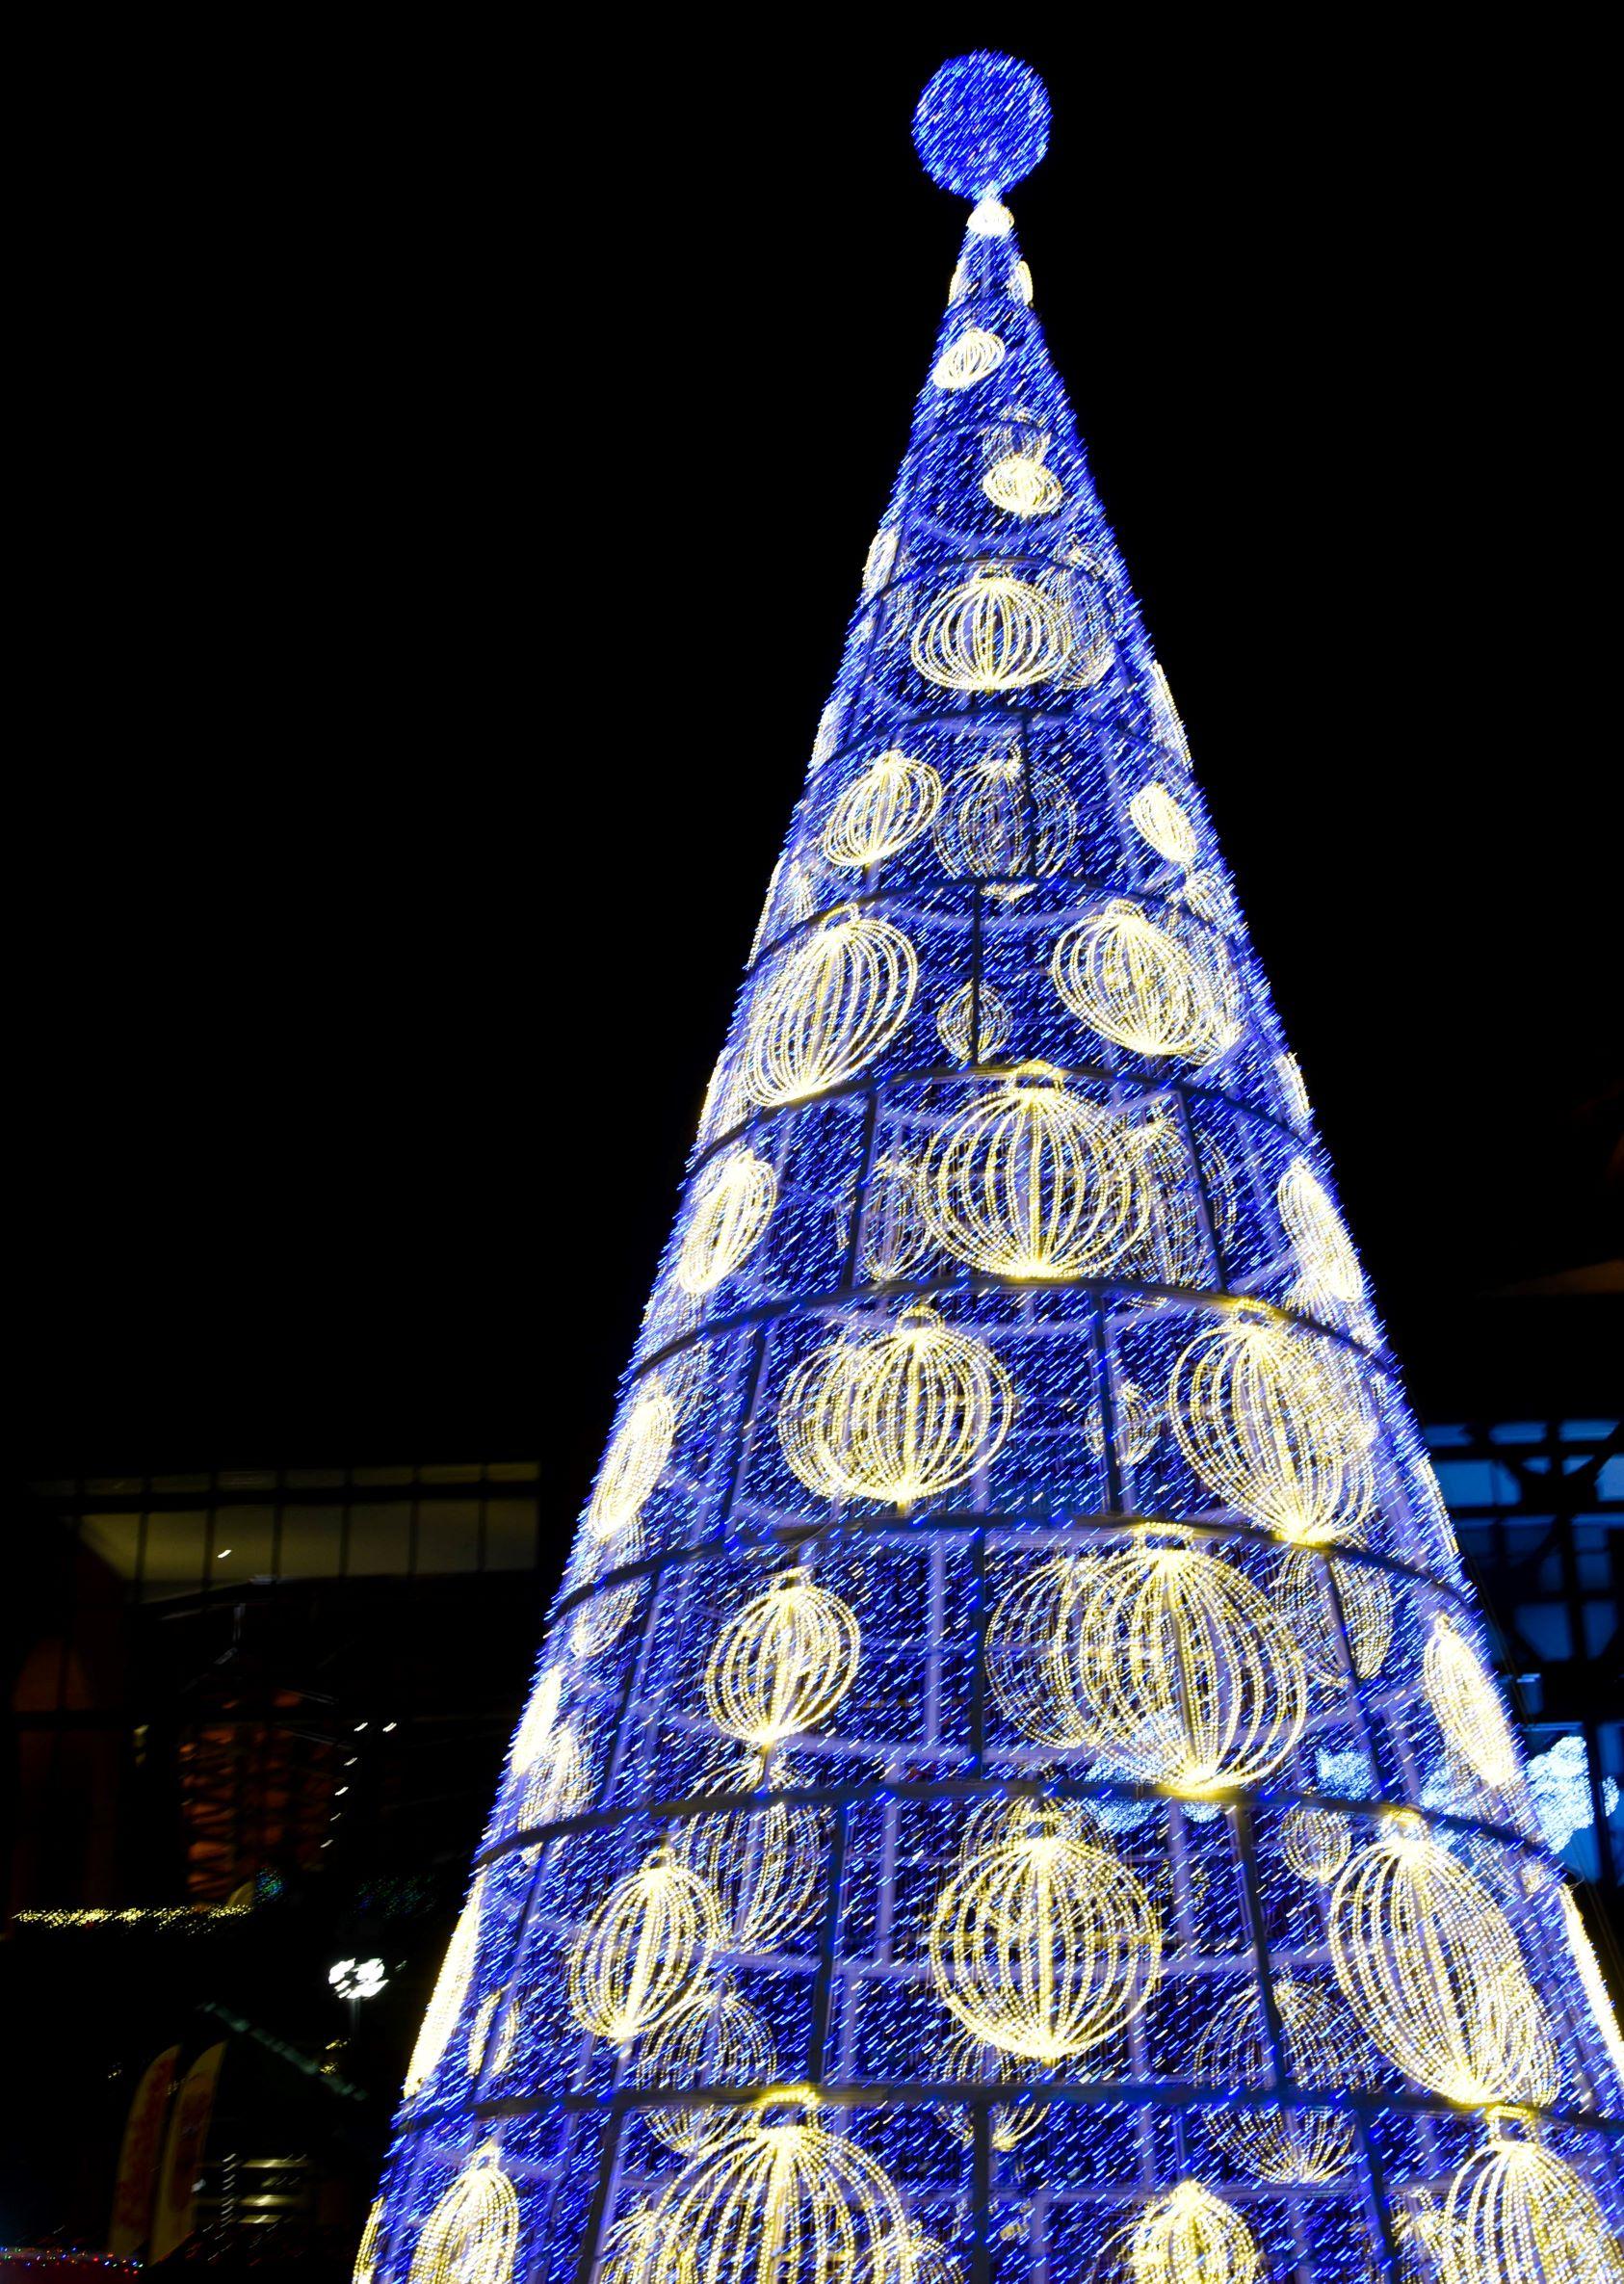 65 ft lighted Christmas Tree